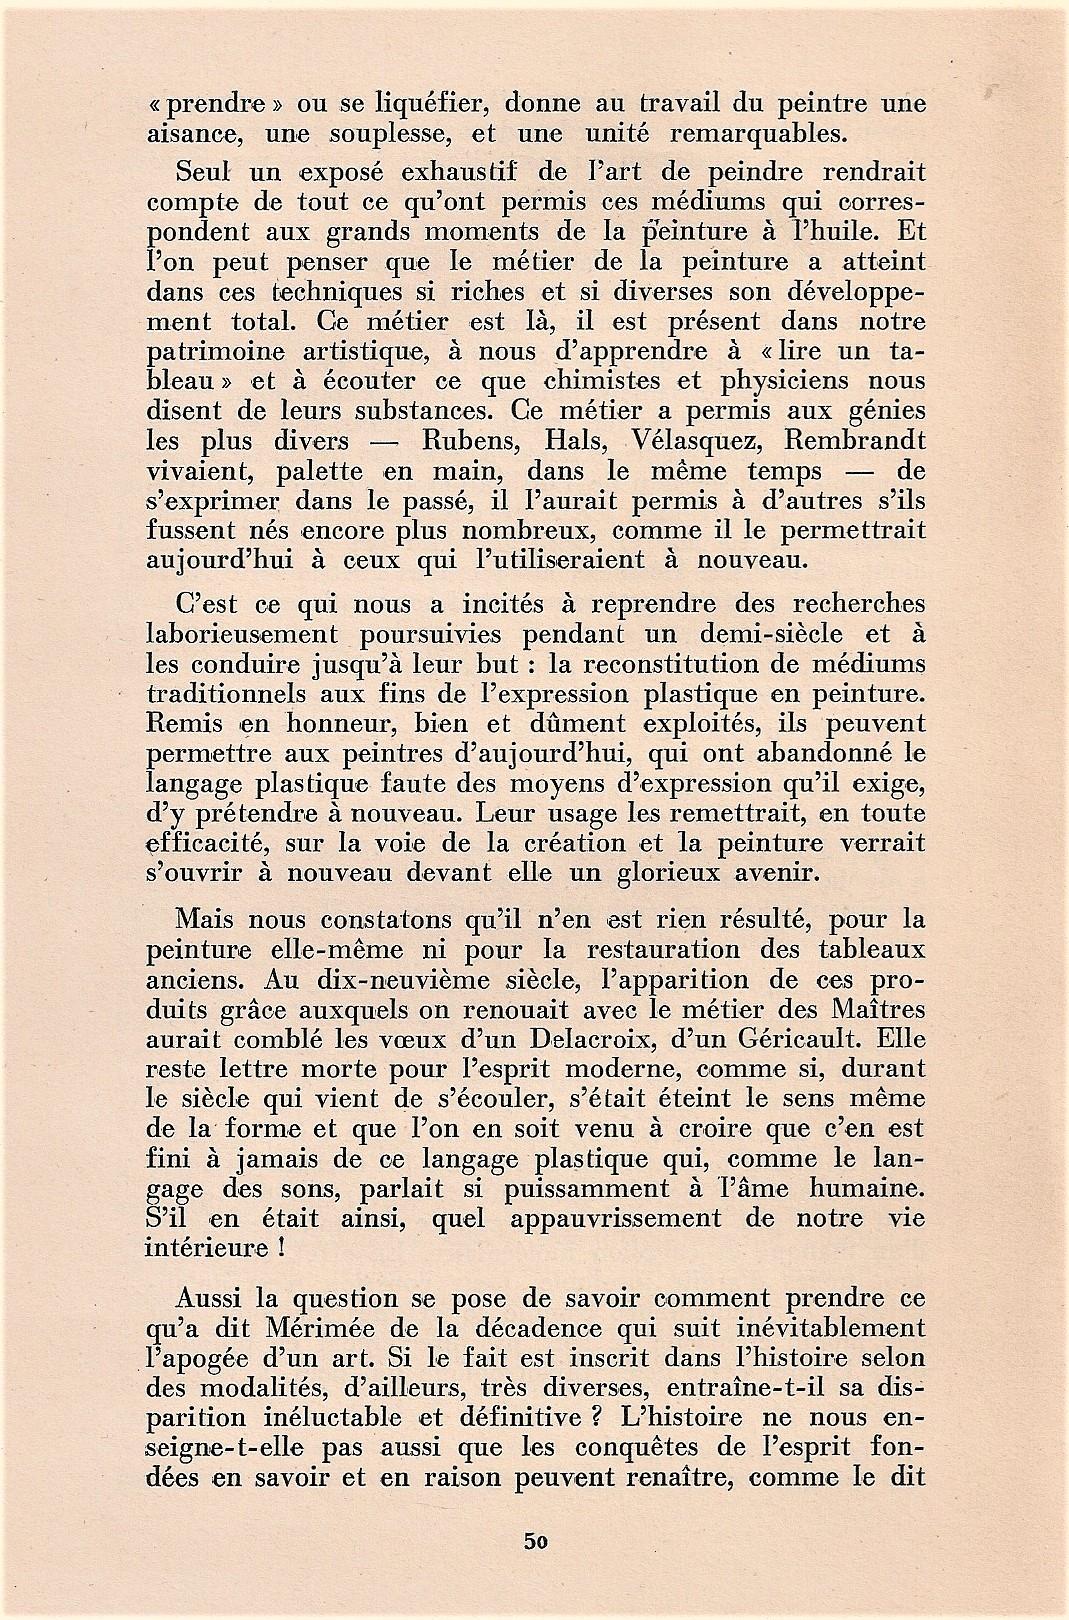 versini-page-50.jpg